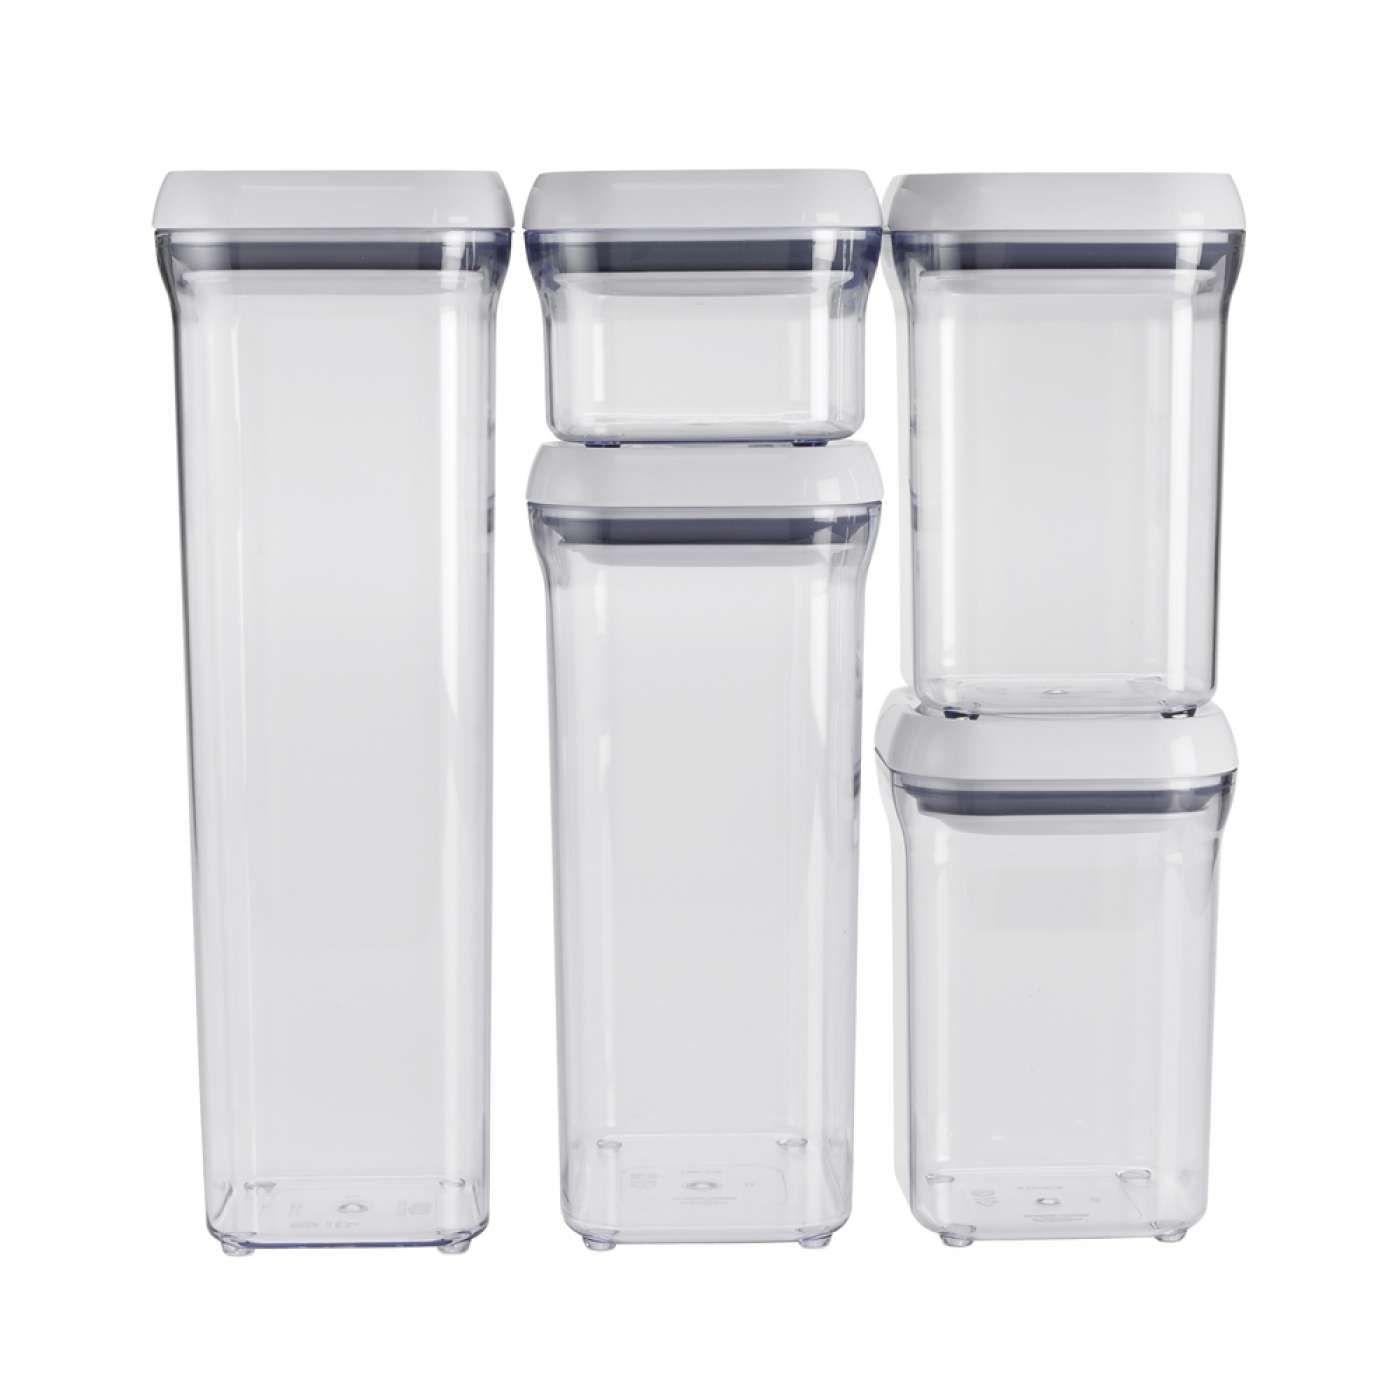 $50  5 Piece Pop Container Set